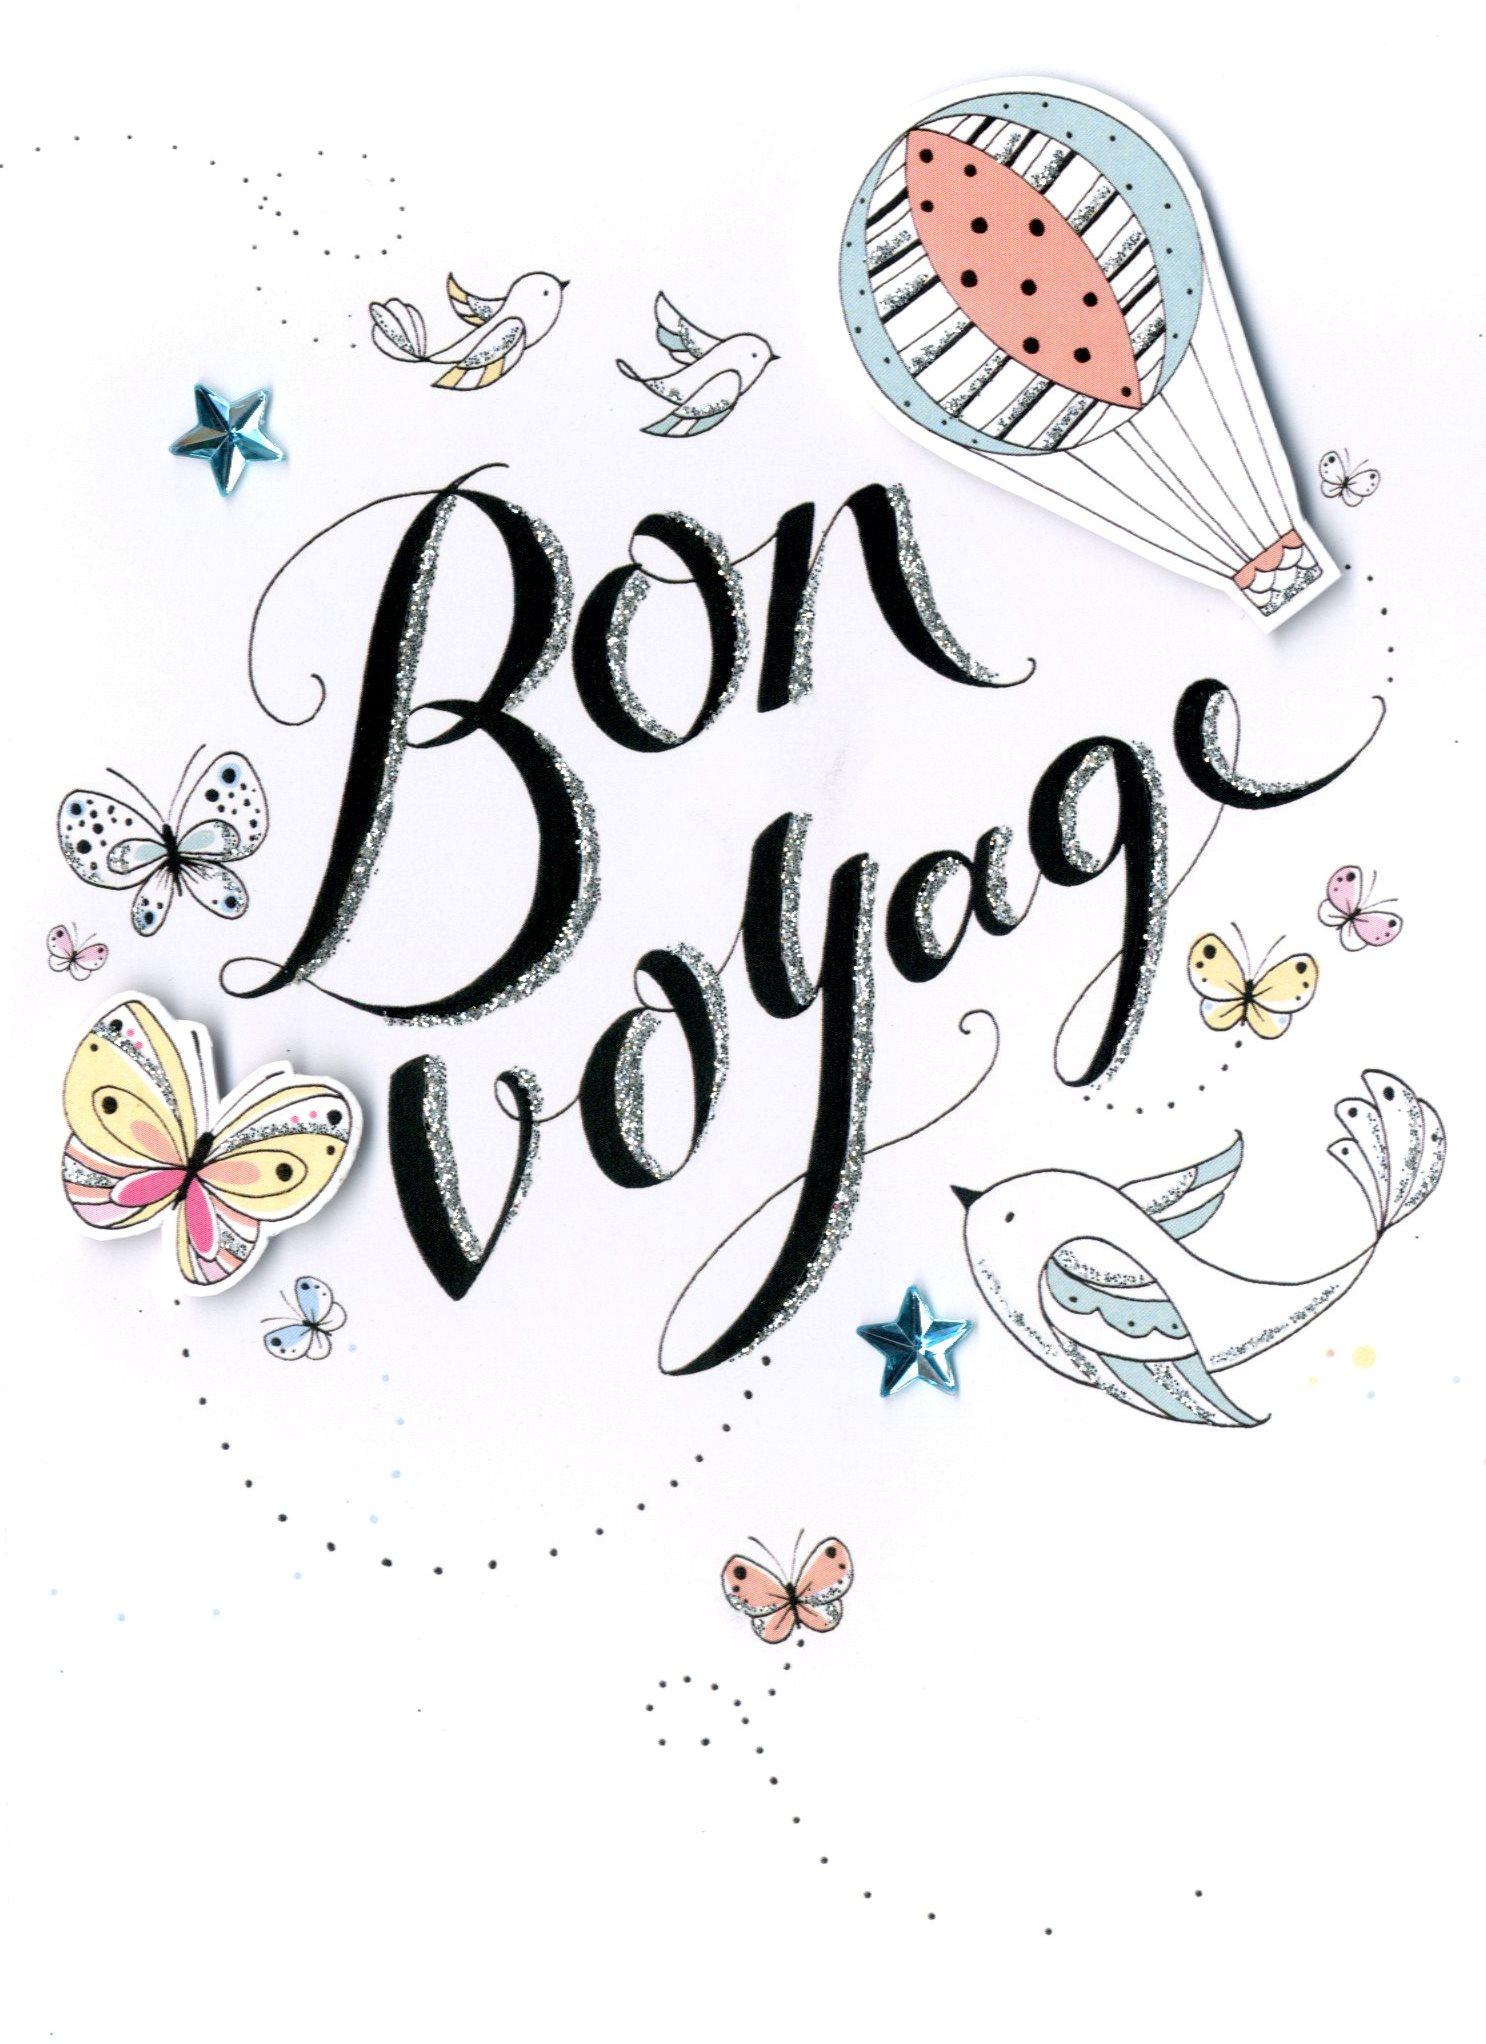 Bon voyage greeting card cards love kates bon voyage greeting card kristyandbryce Image collections